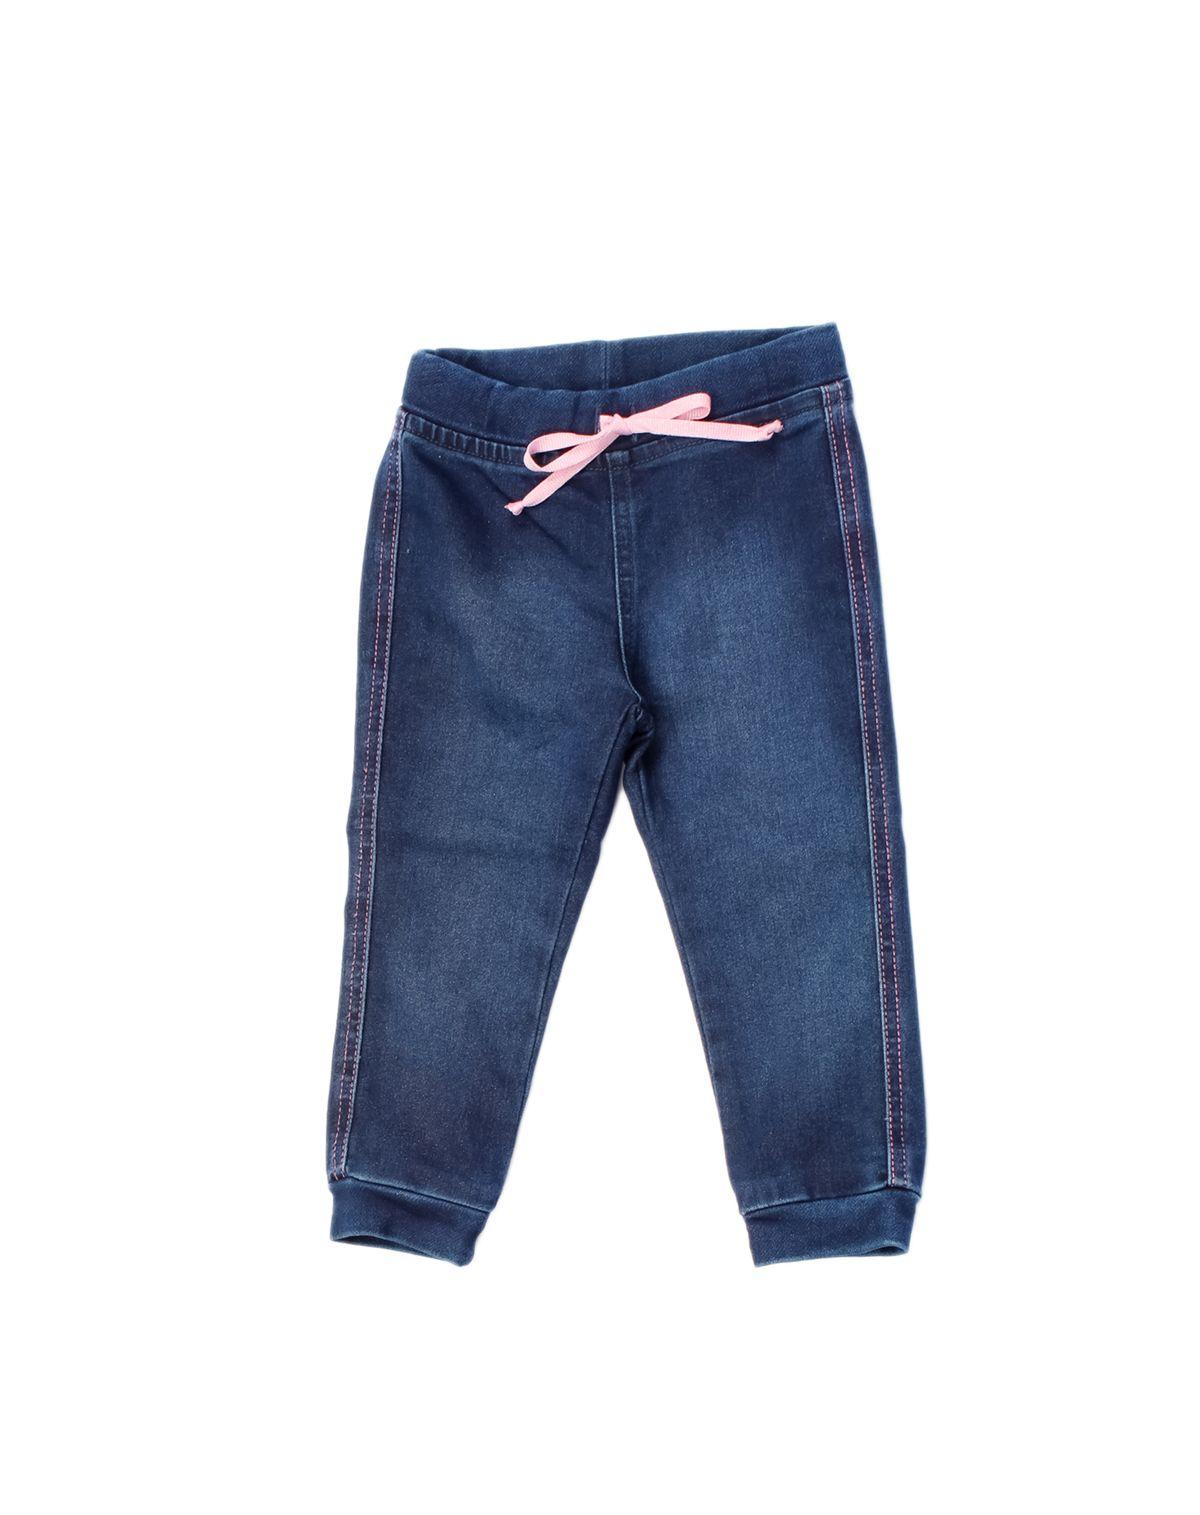 581040002-calca-jeans-bebe-menina-cordao-ajuste-jeans-2-7de